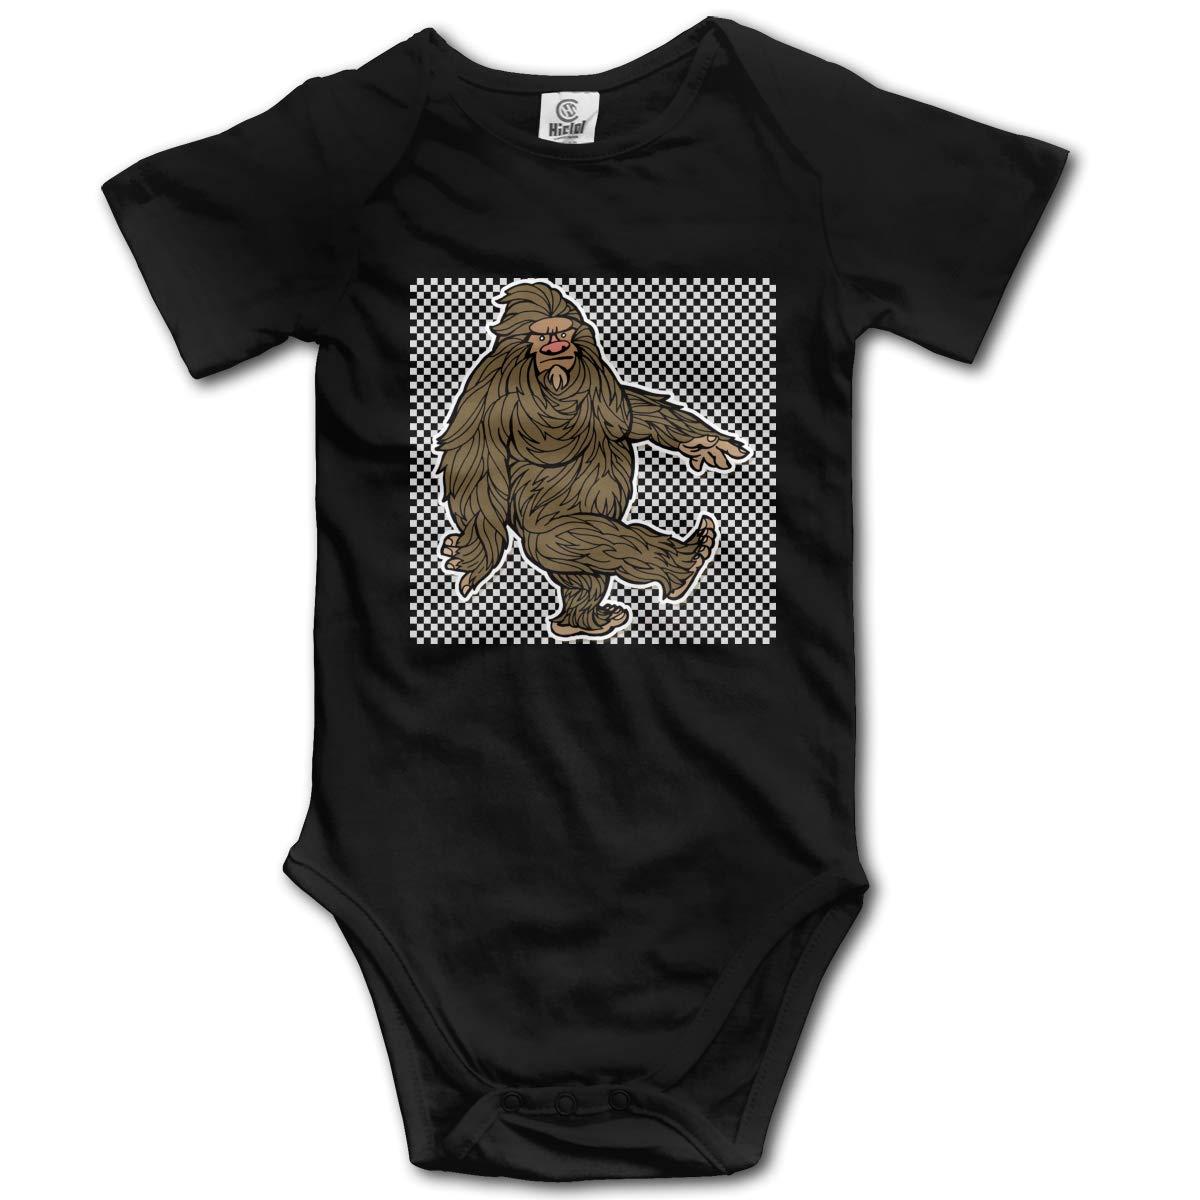 FOECBIR Brown Bigfoot Clipart Infant Boys Girls Jumpsuit Short-Sleeve Romper Bodysuits